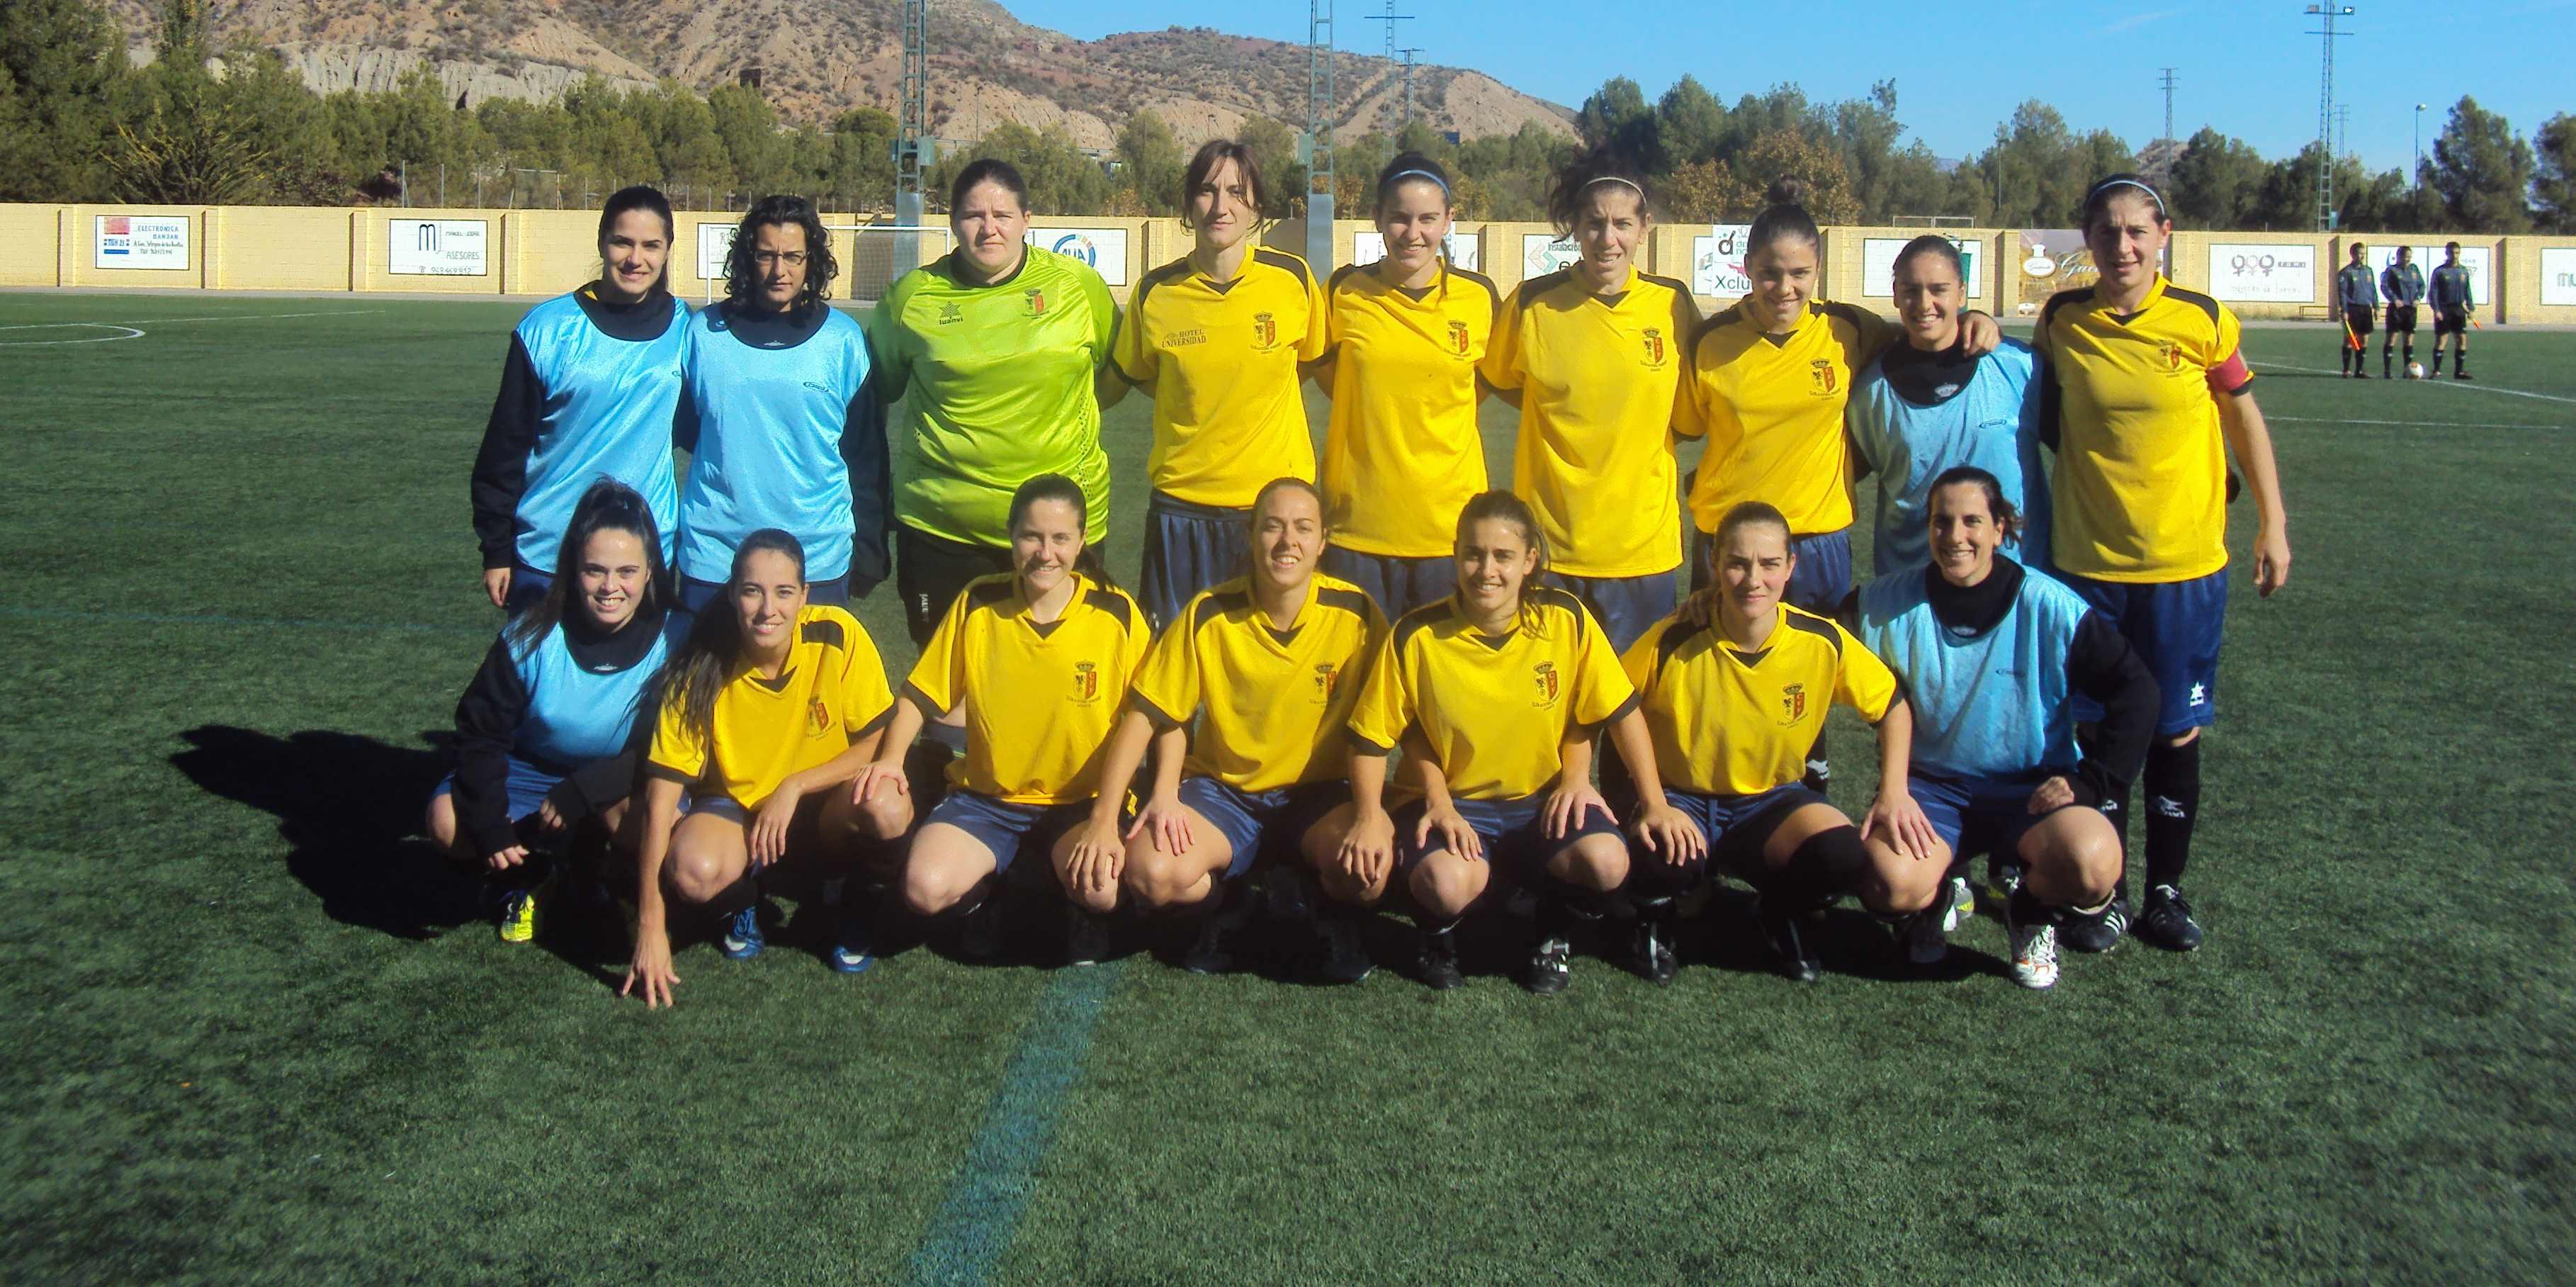 Elche CF - CFF Albacete (Foto: Maribel Montero)